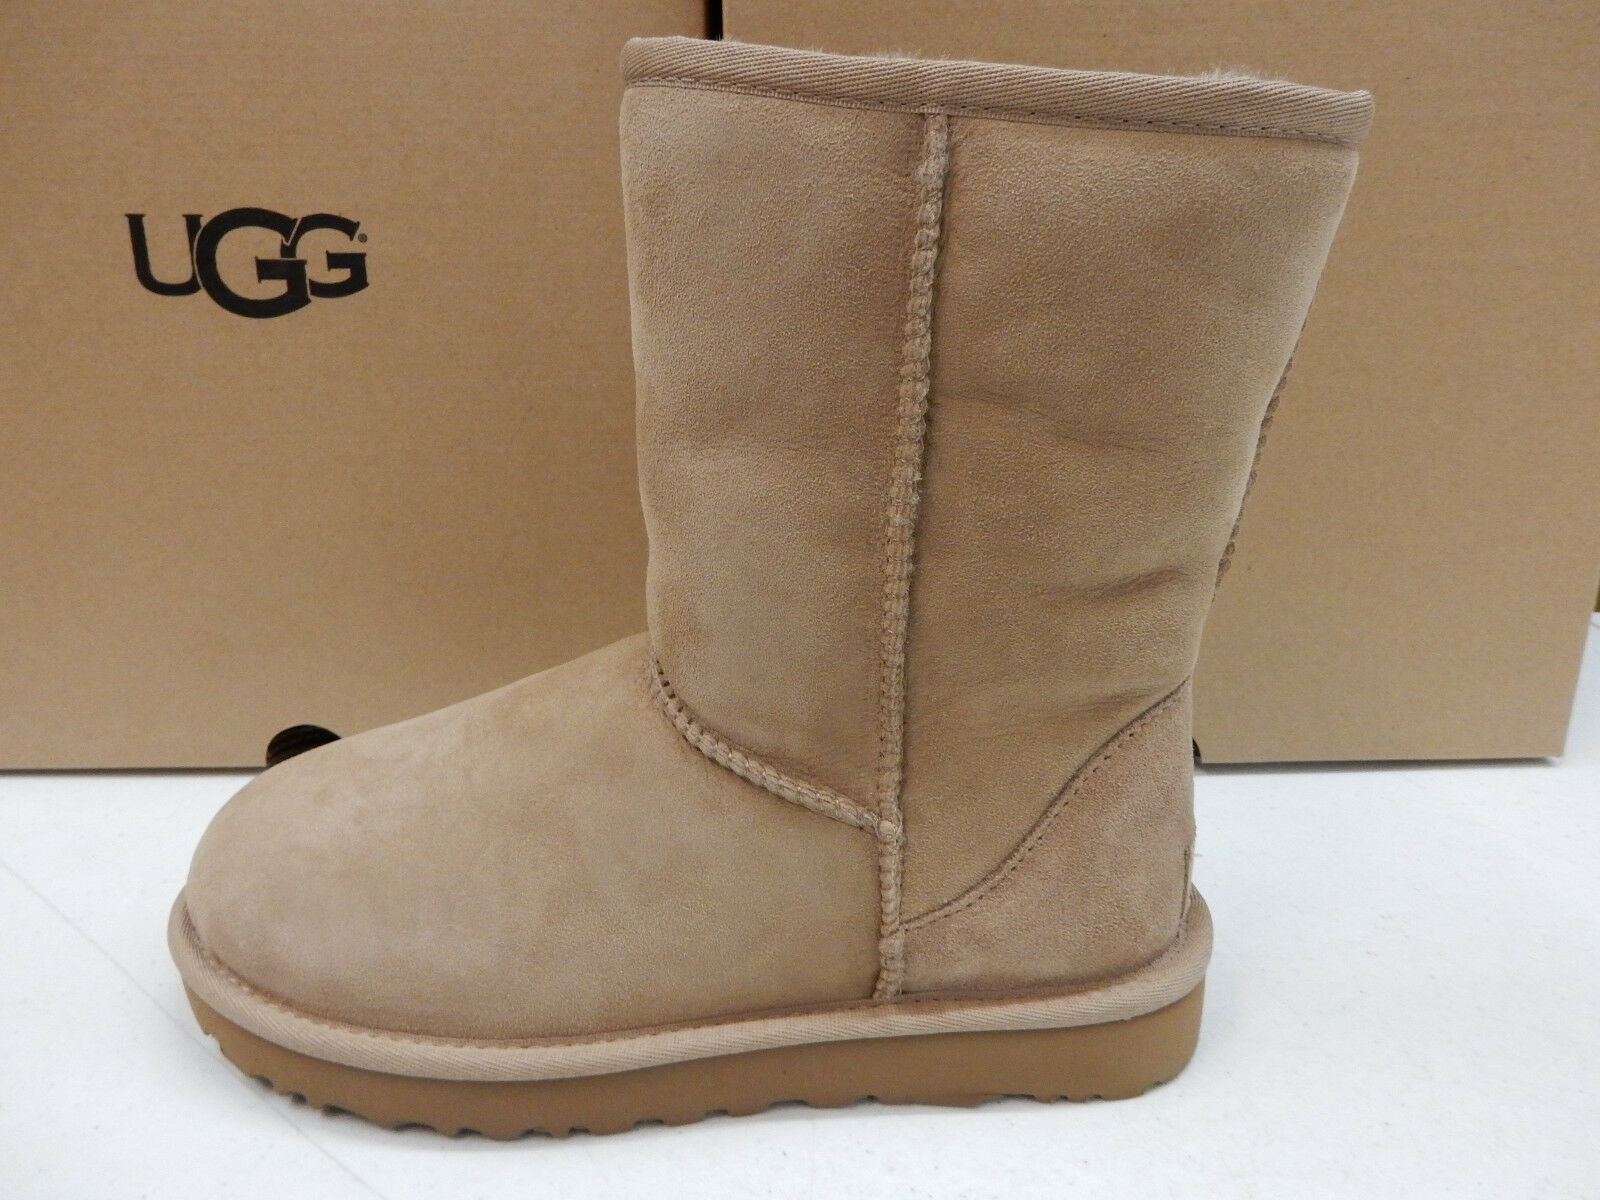 9db38661b54 Women UGG Australia Classic Short II Boot 1016223 Fawn Twinface 100  Authentic 6